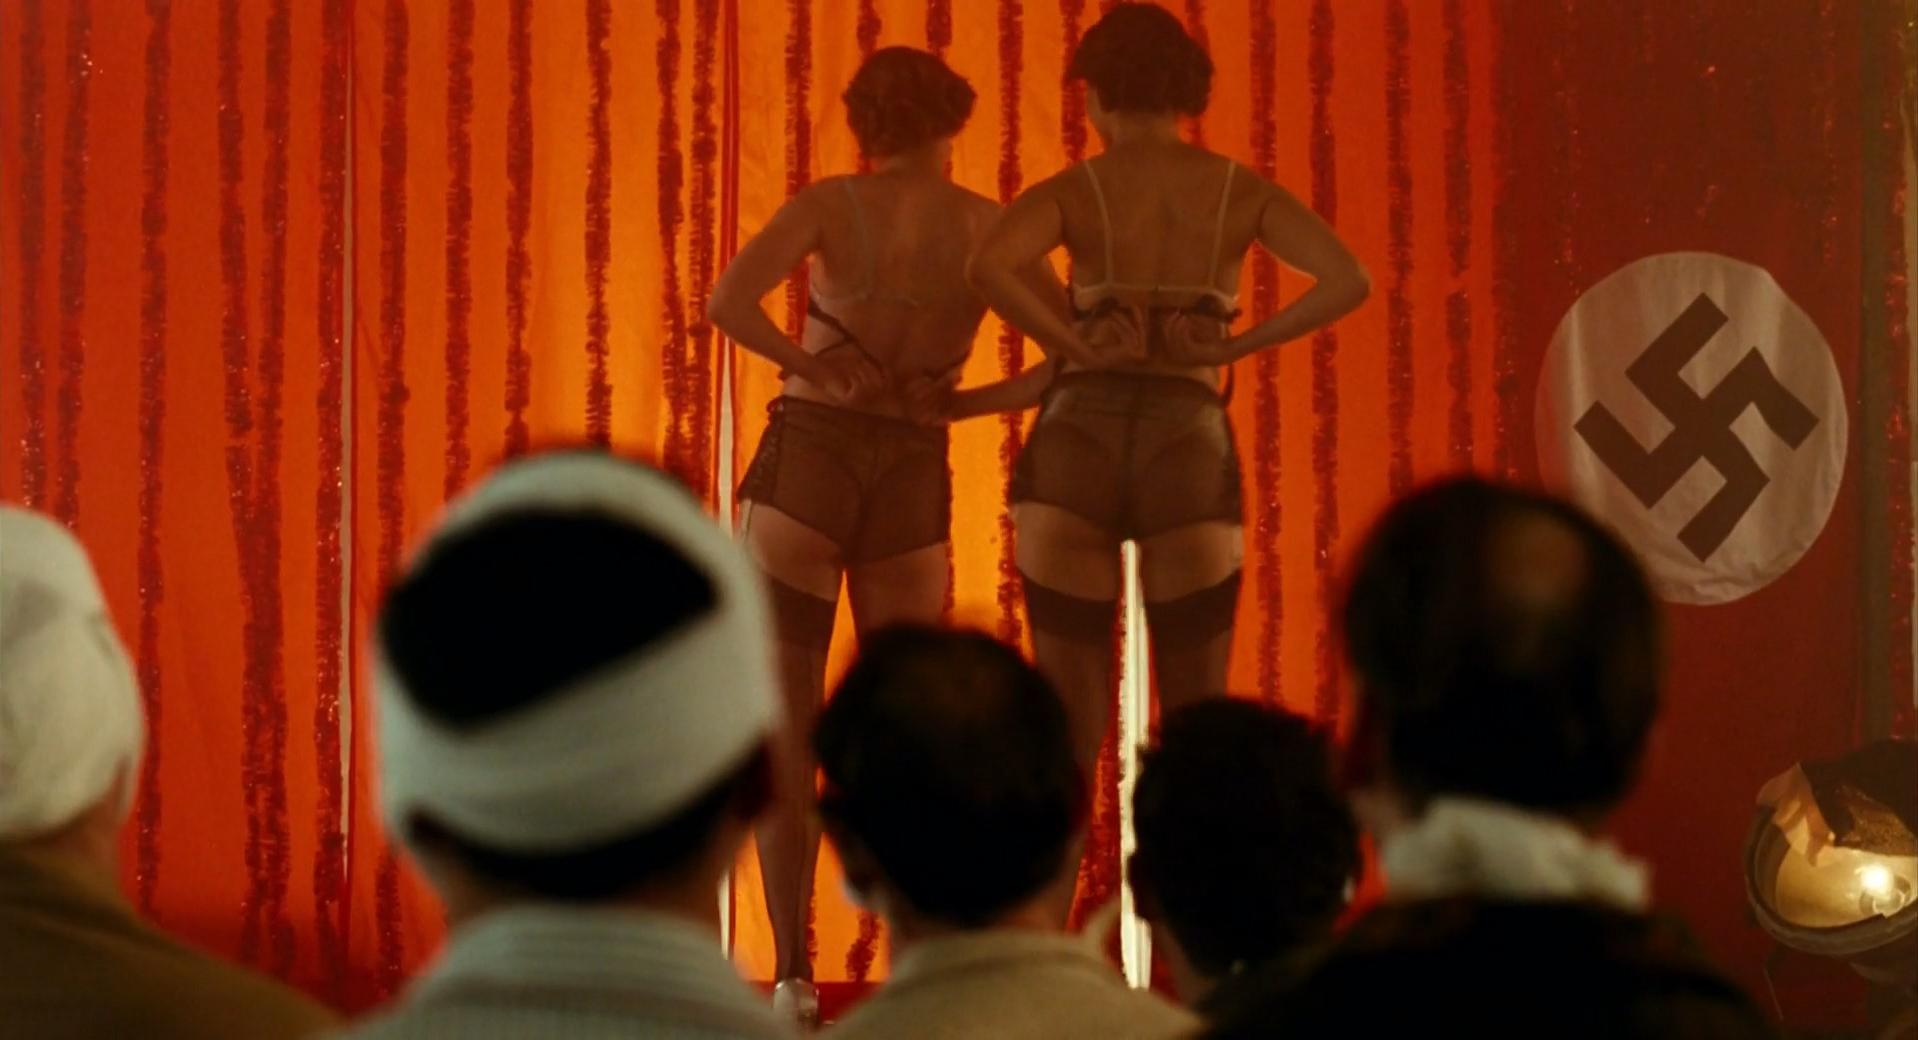 Julie Depardieu nude, Marie Gillain nude - Les femmes de l'ombre (2008)